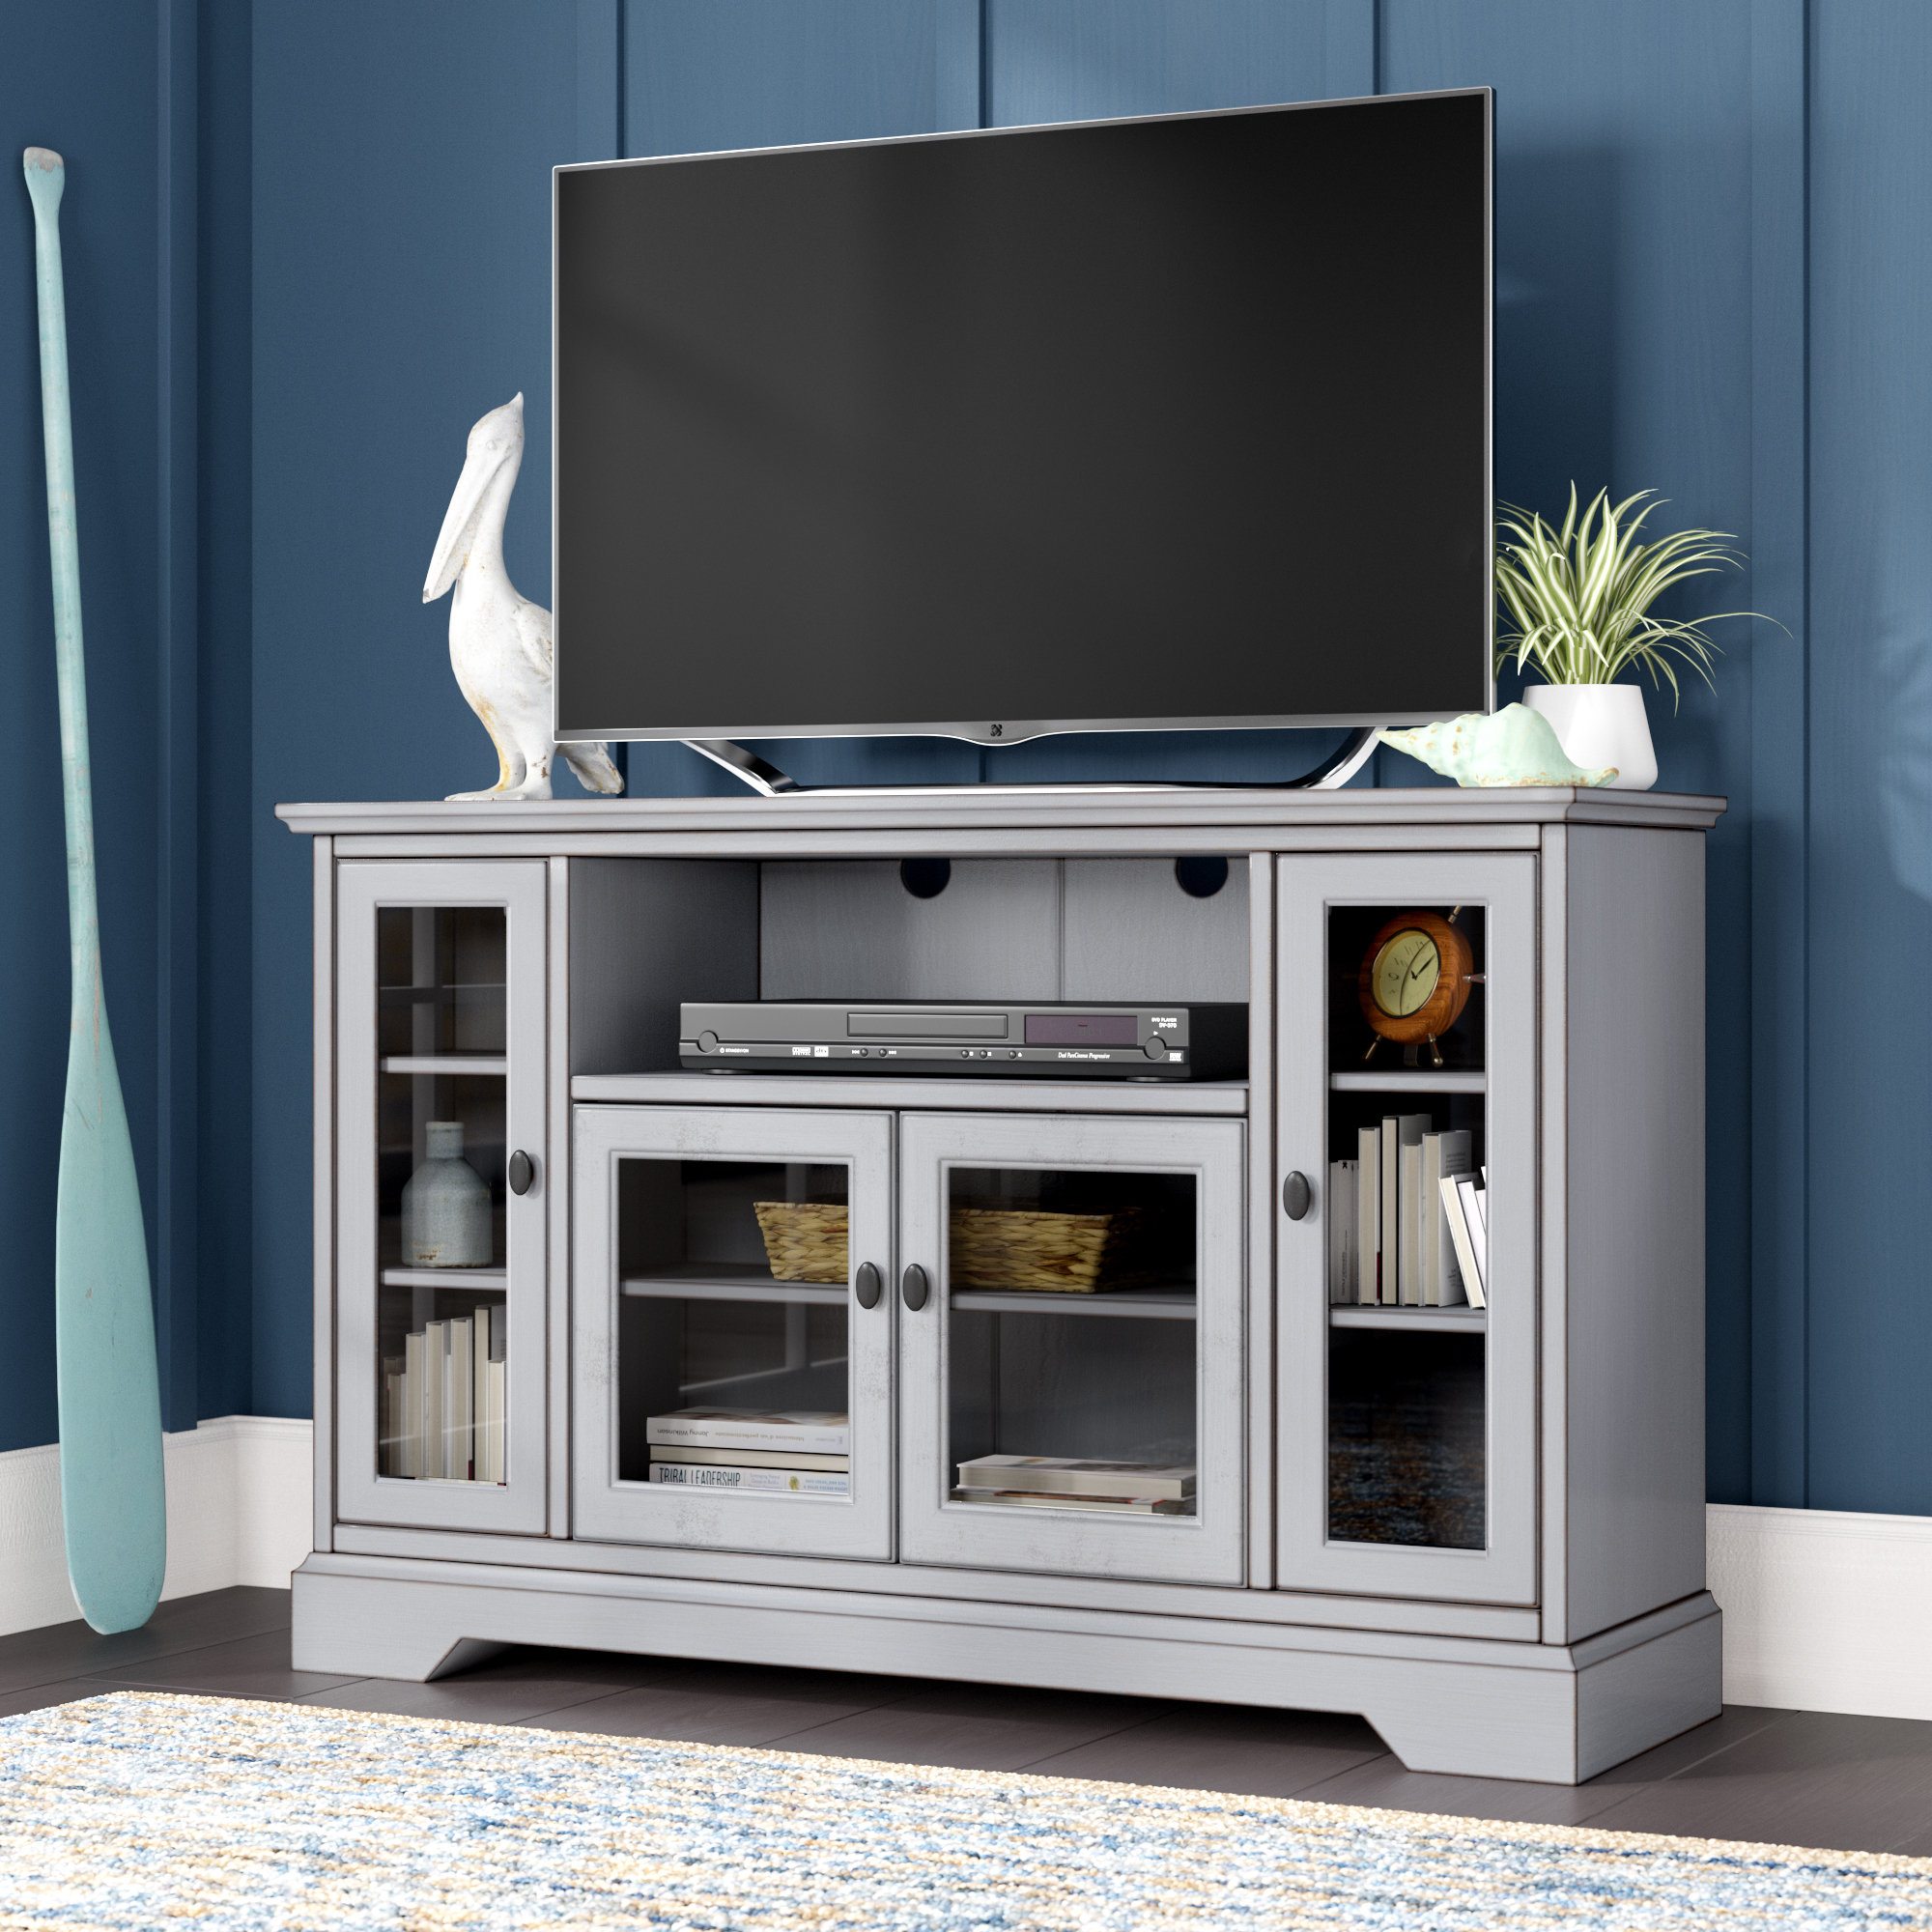 Tv Stands & Entertainment Centers You'll Love | Wayfair Regarding Ducar 74 Inch Tv Stands (View 20 of 30)